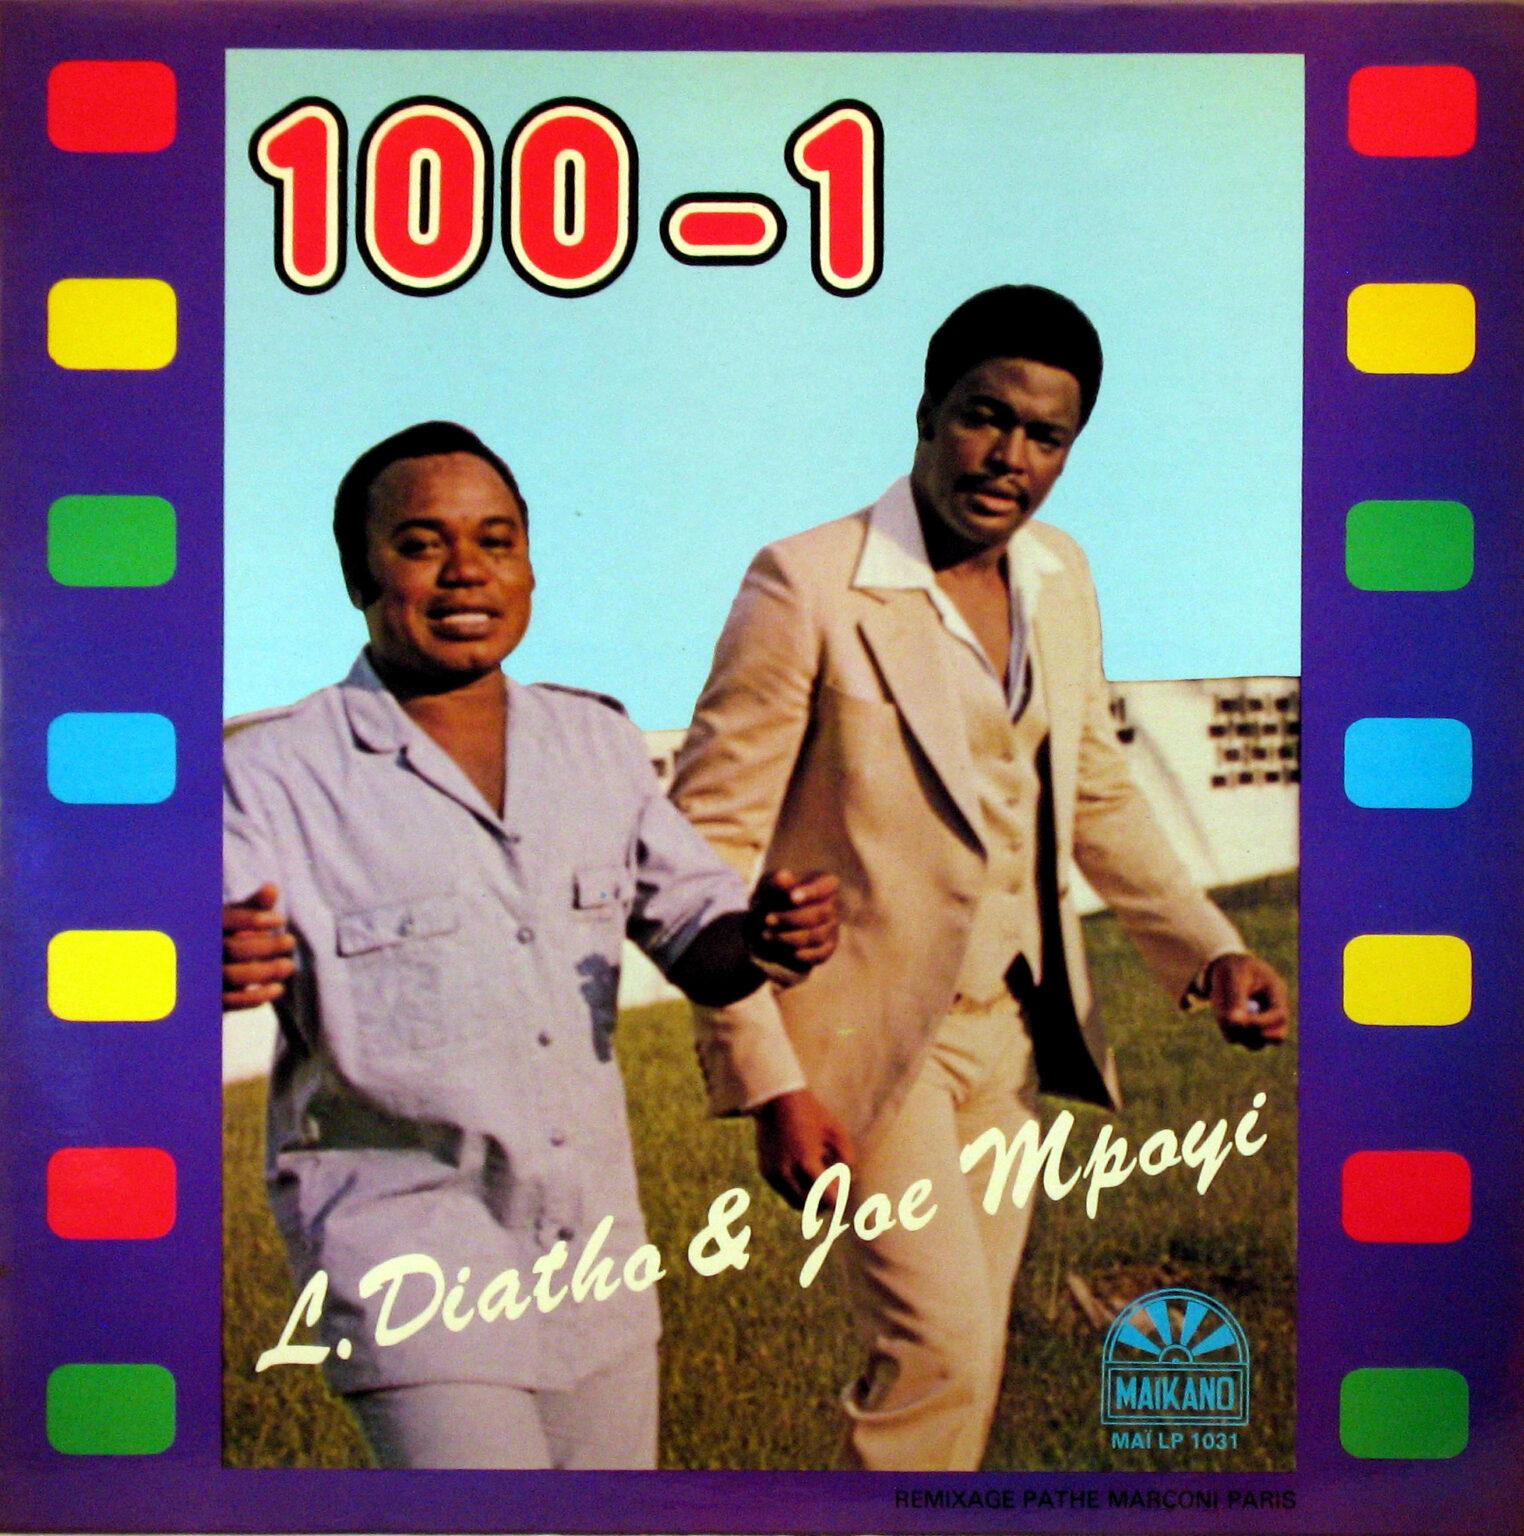 L. Diatho & Joe Mpoyi – 100-1 : 80's CONGOLESE Soukous Rumba Music ALBUM LP